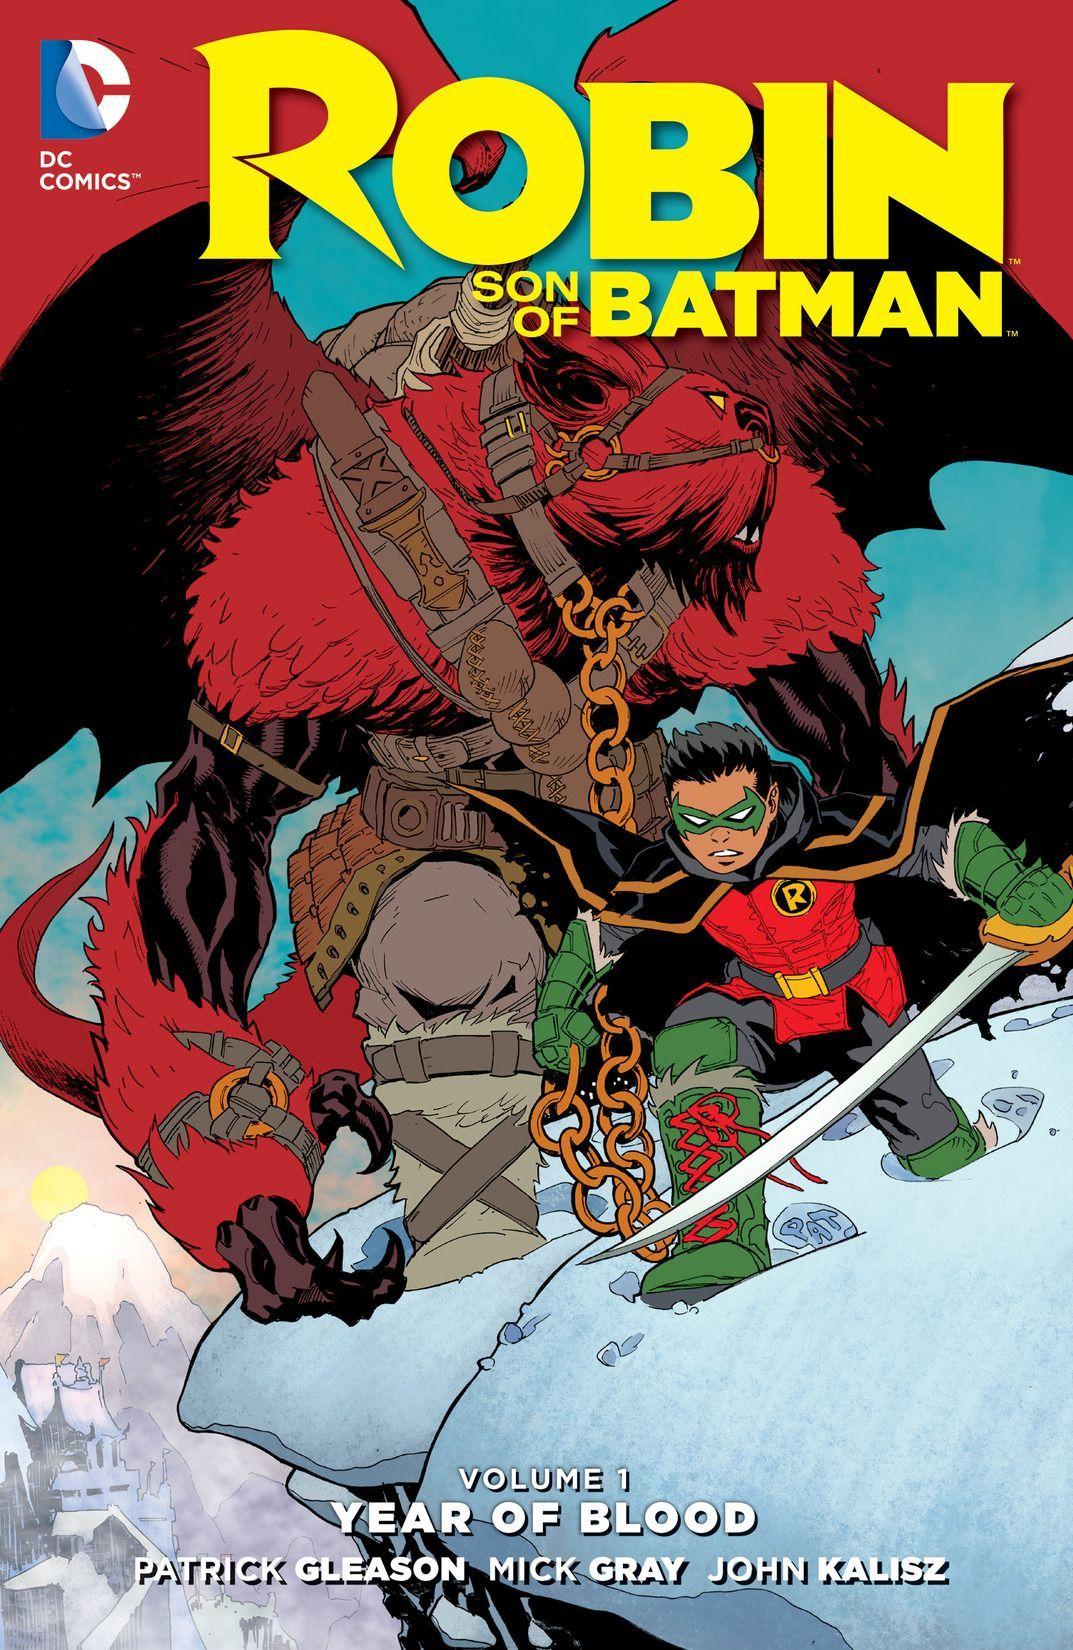 Robin: Son of Batman, Volume 1: Year of Blood